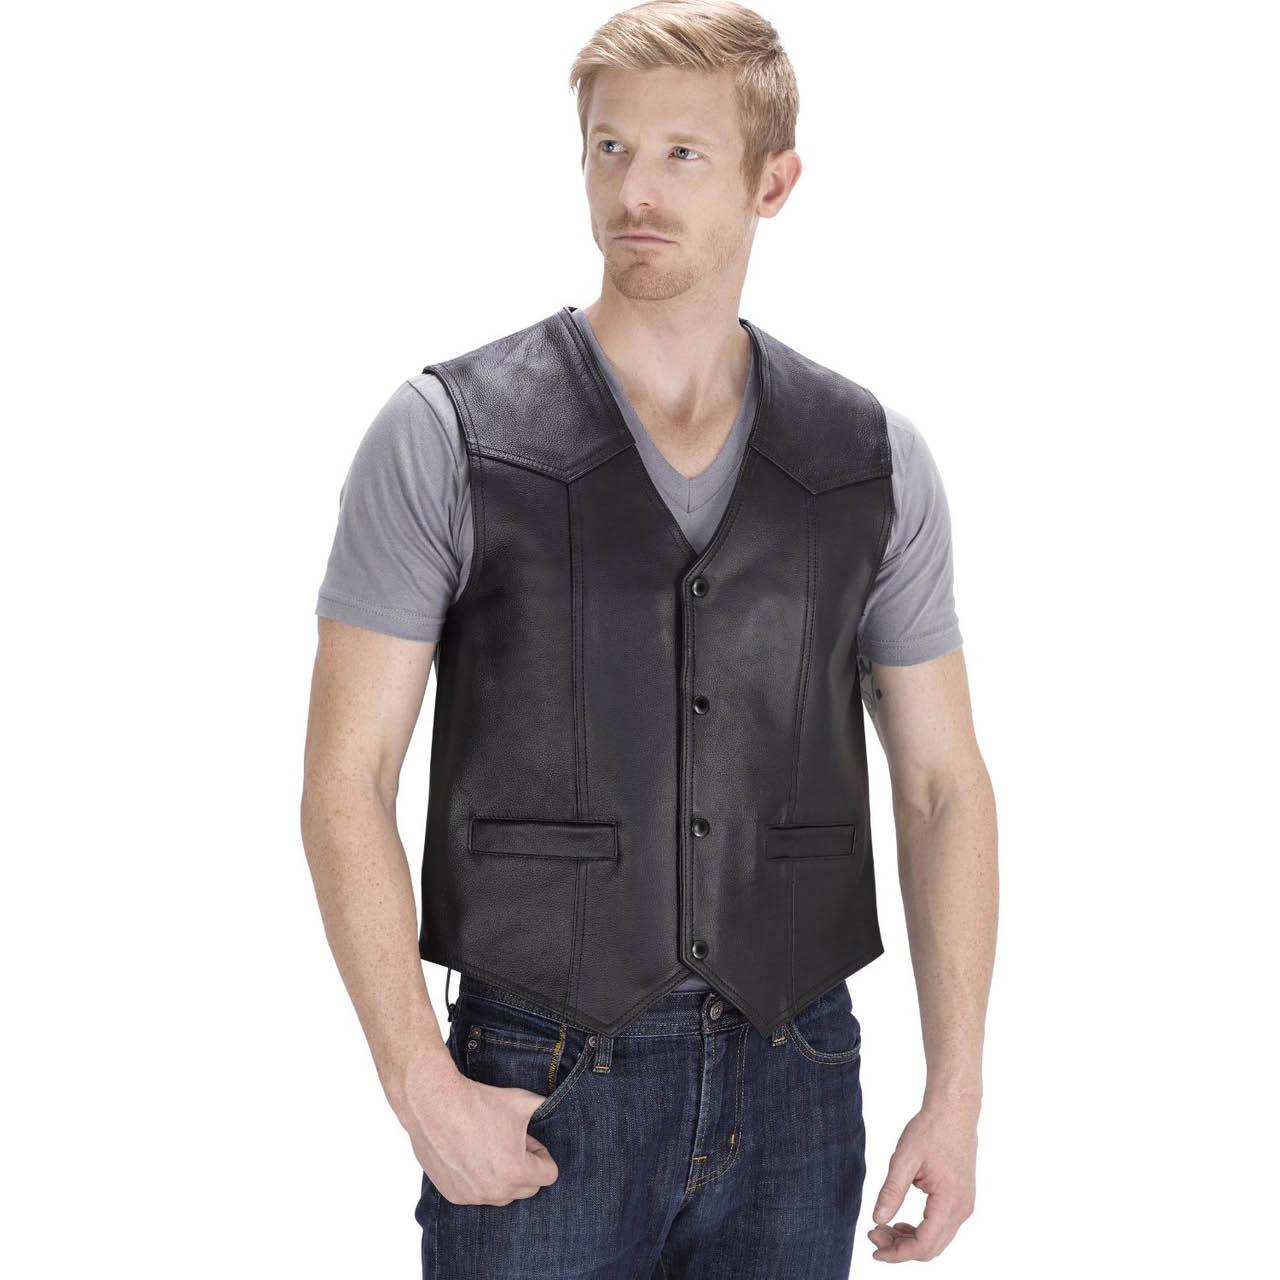 Leather vest near Fremont, CA